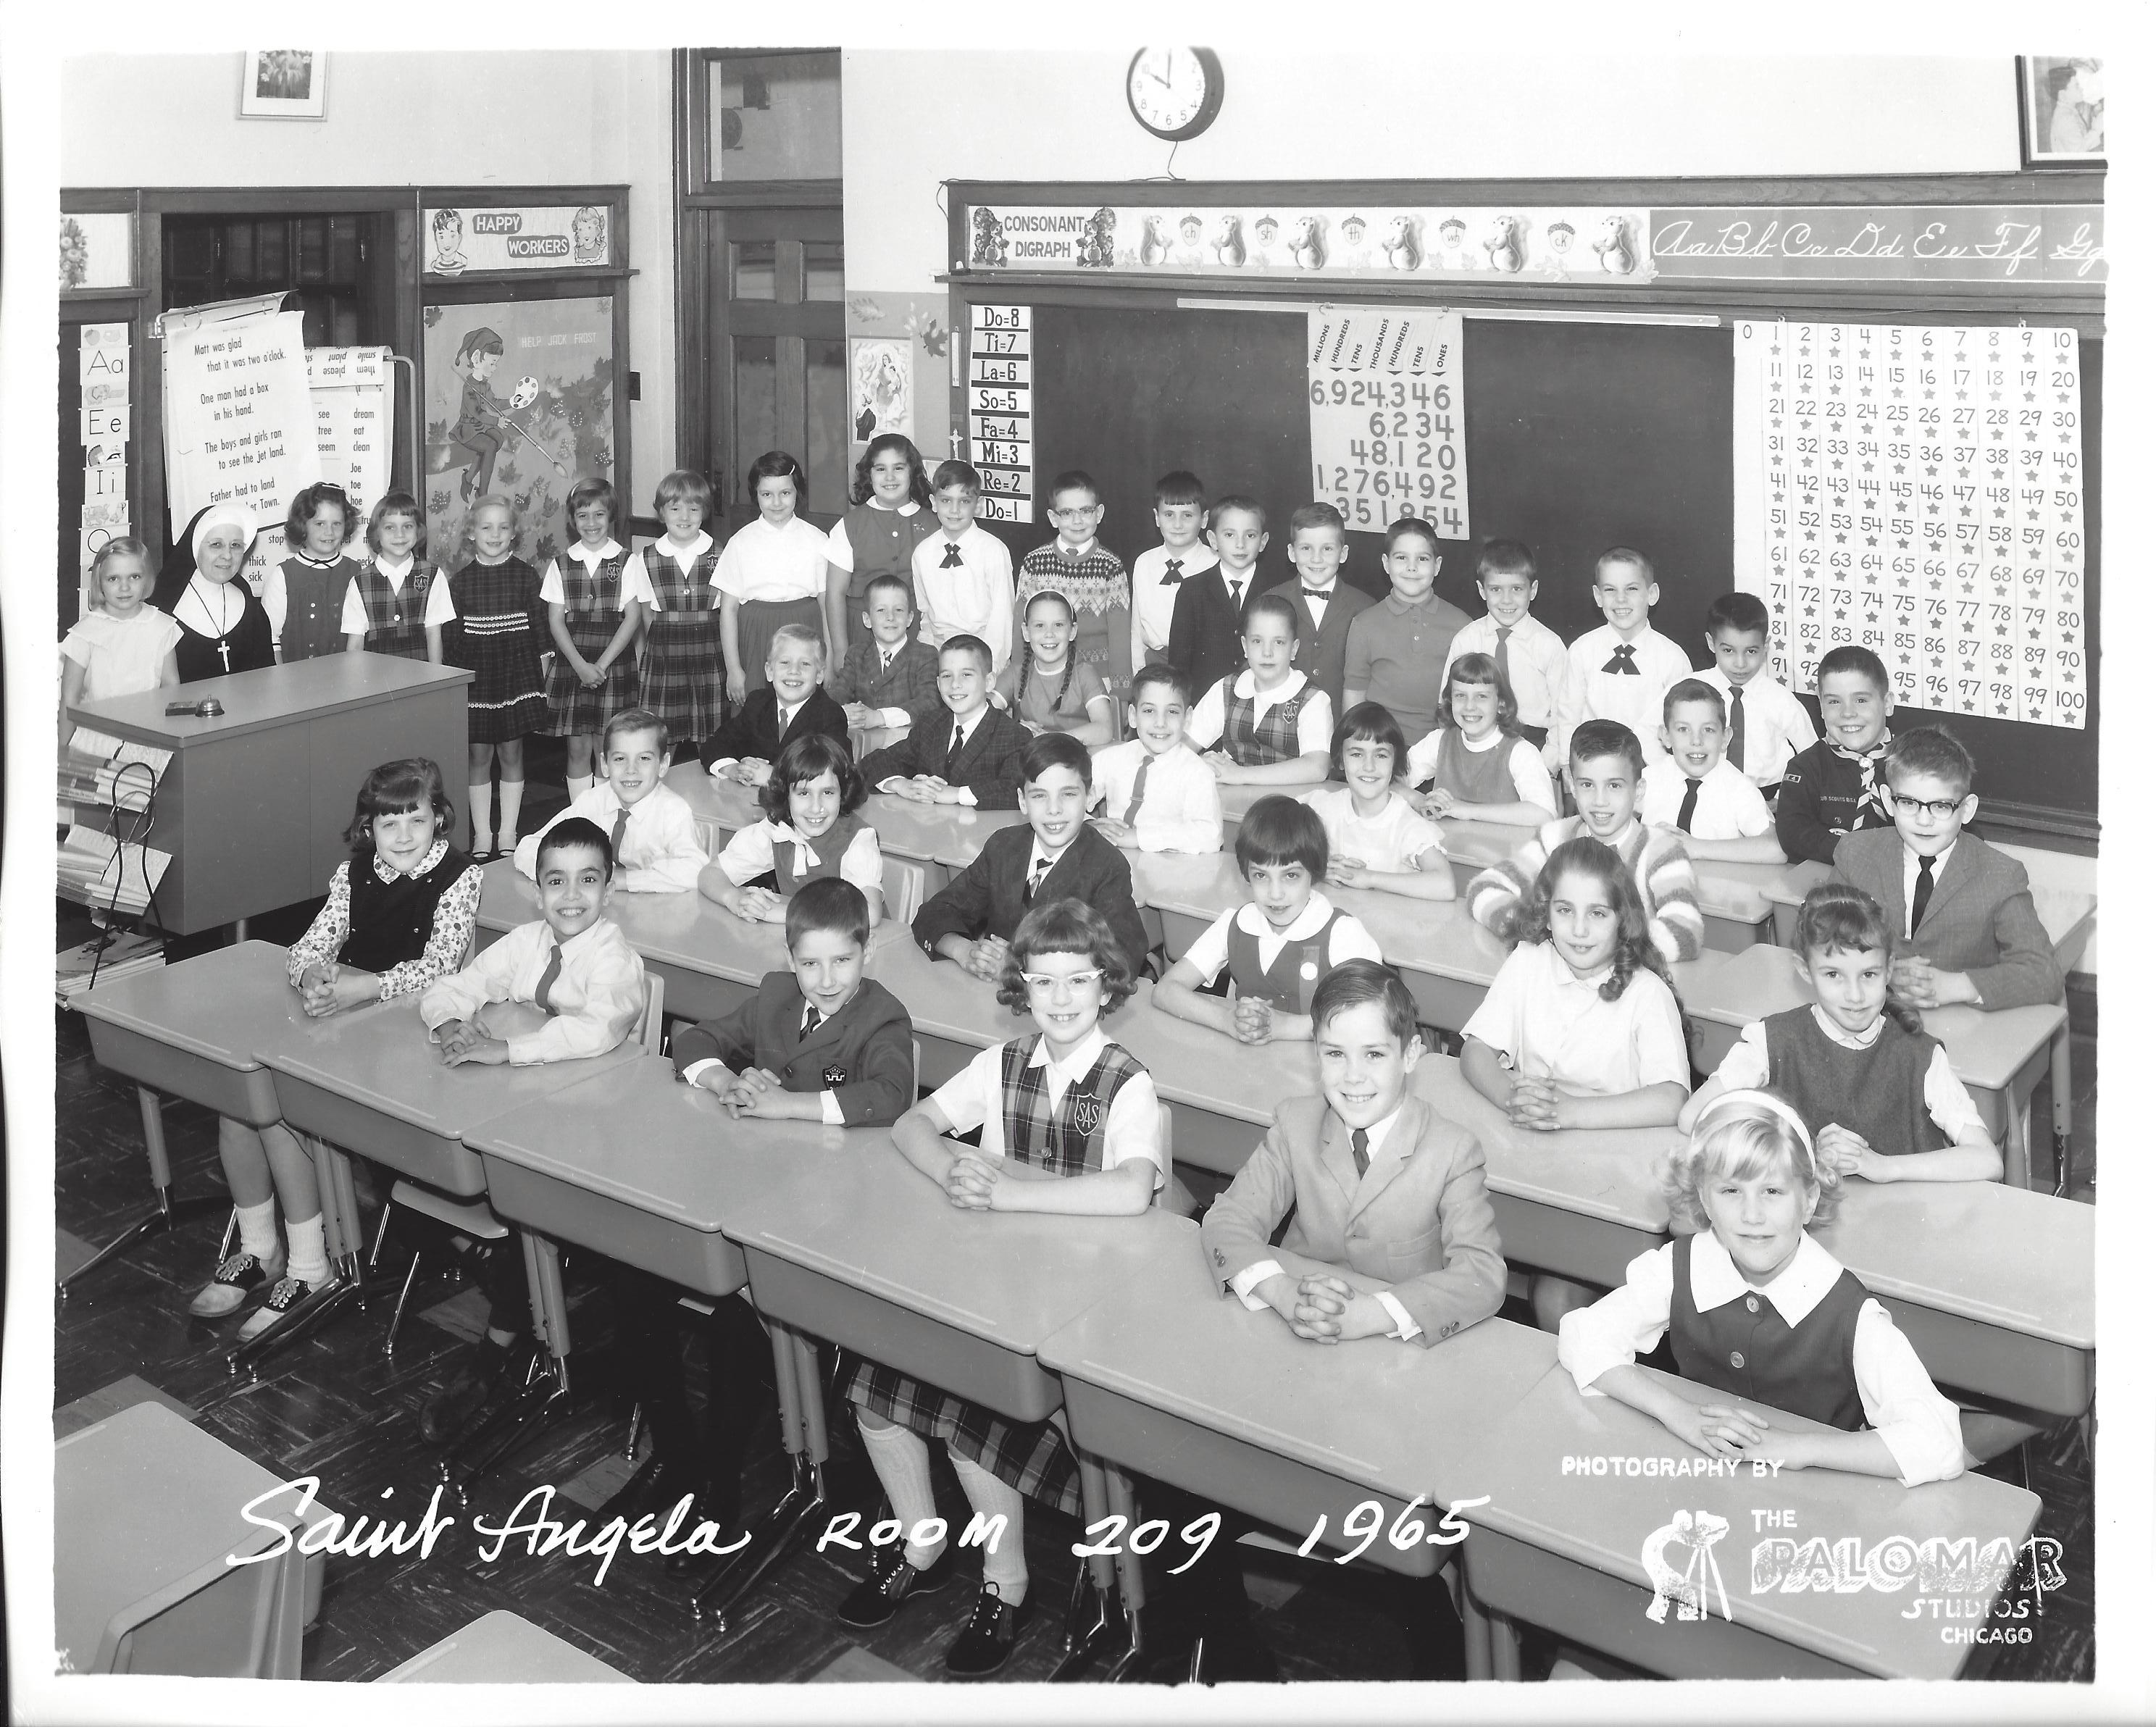 1965 Grade Three Room 209